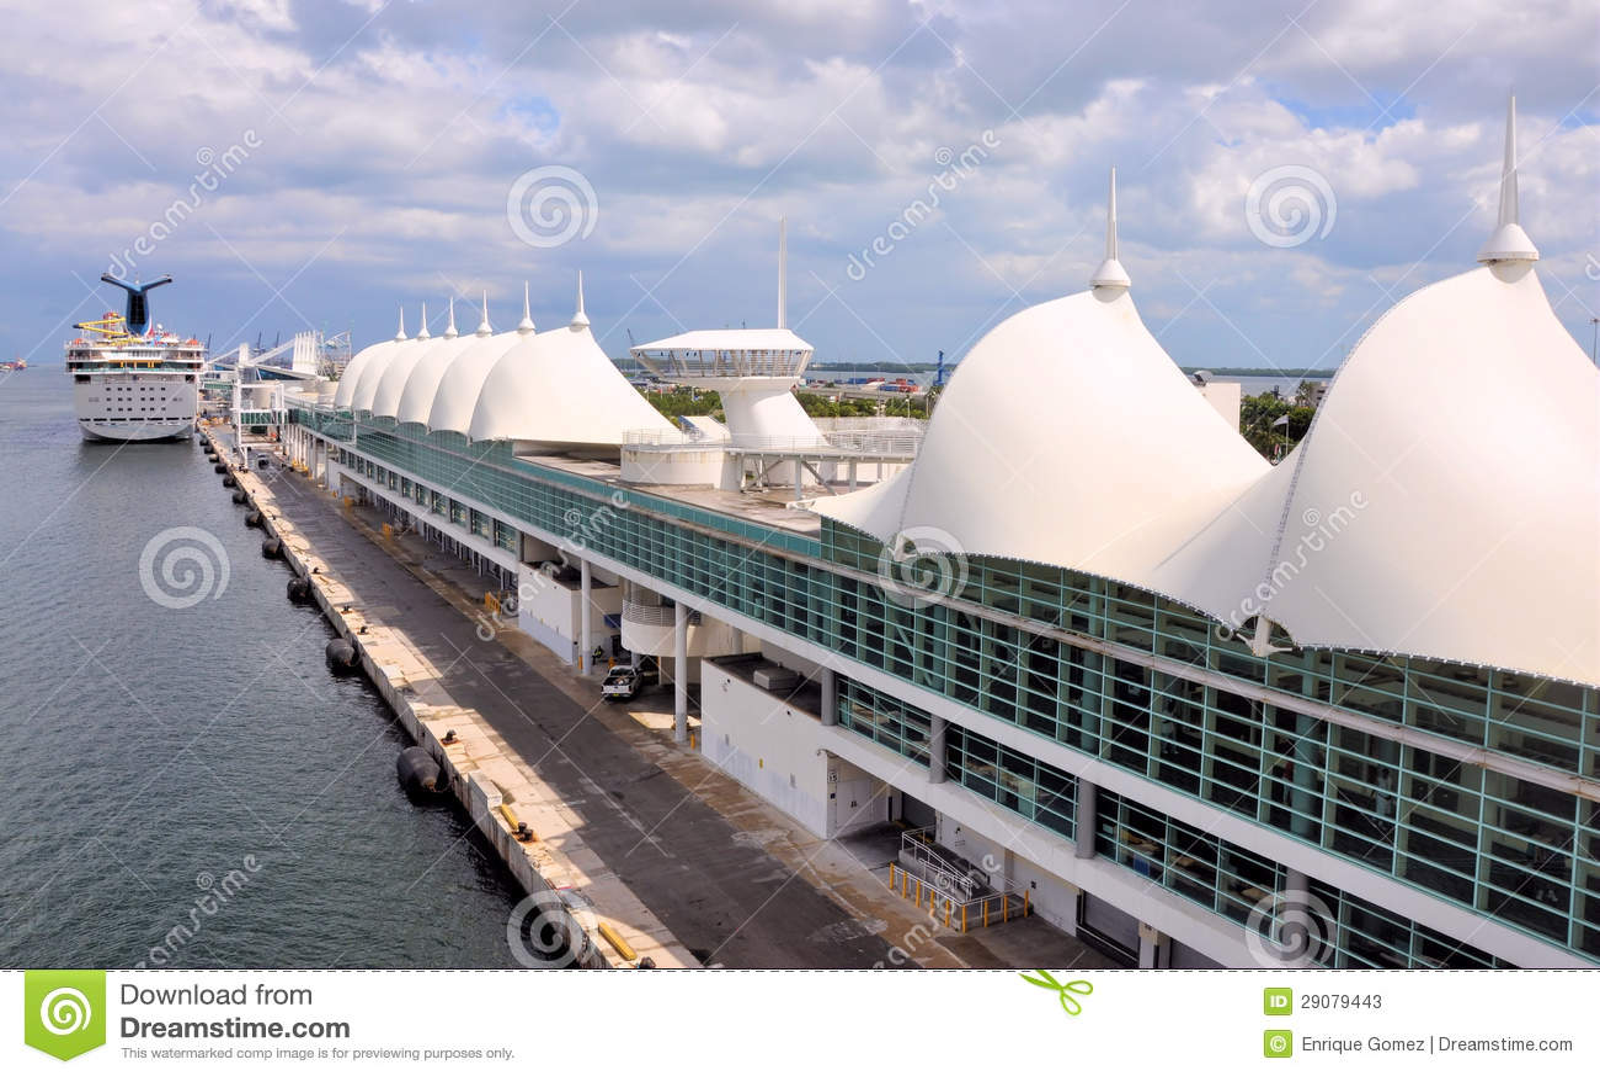 Miami Cruise Terminal Stock Image Image Of Industrial - Miami cruise ship terminal